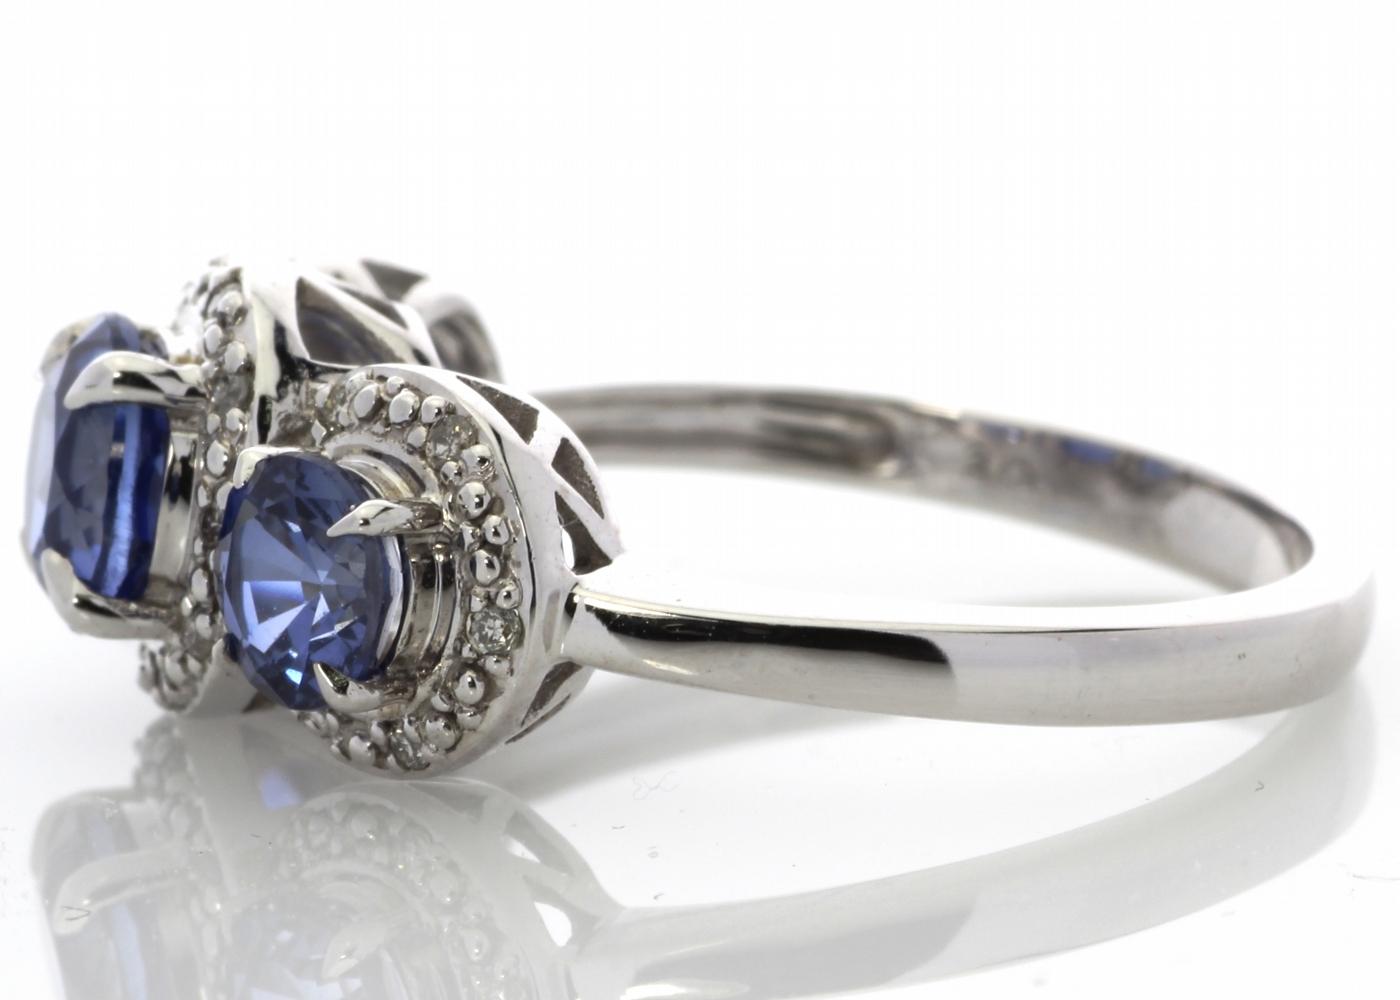 9ct White Gold Created Ceylon Sapphire And Diamond Ring - Image 4 of 6